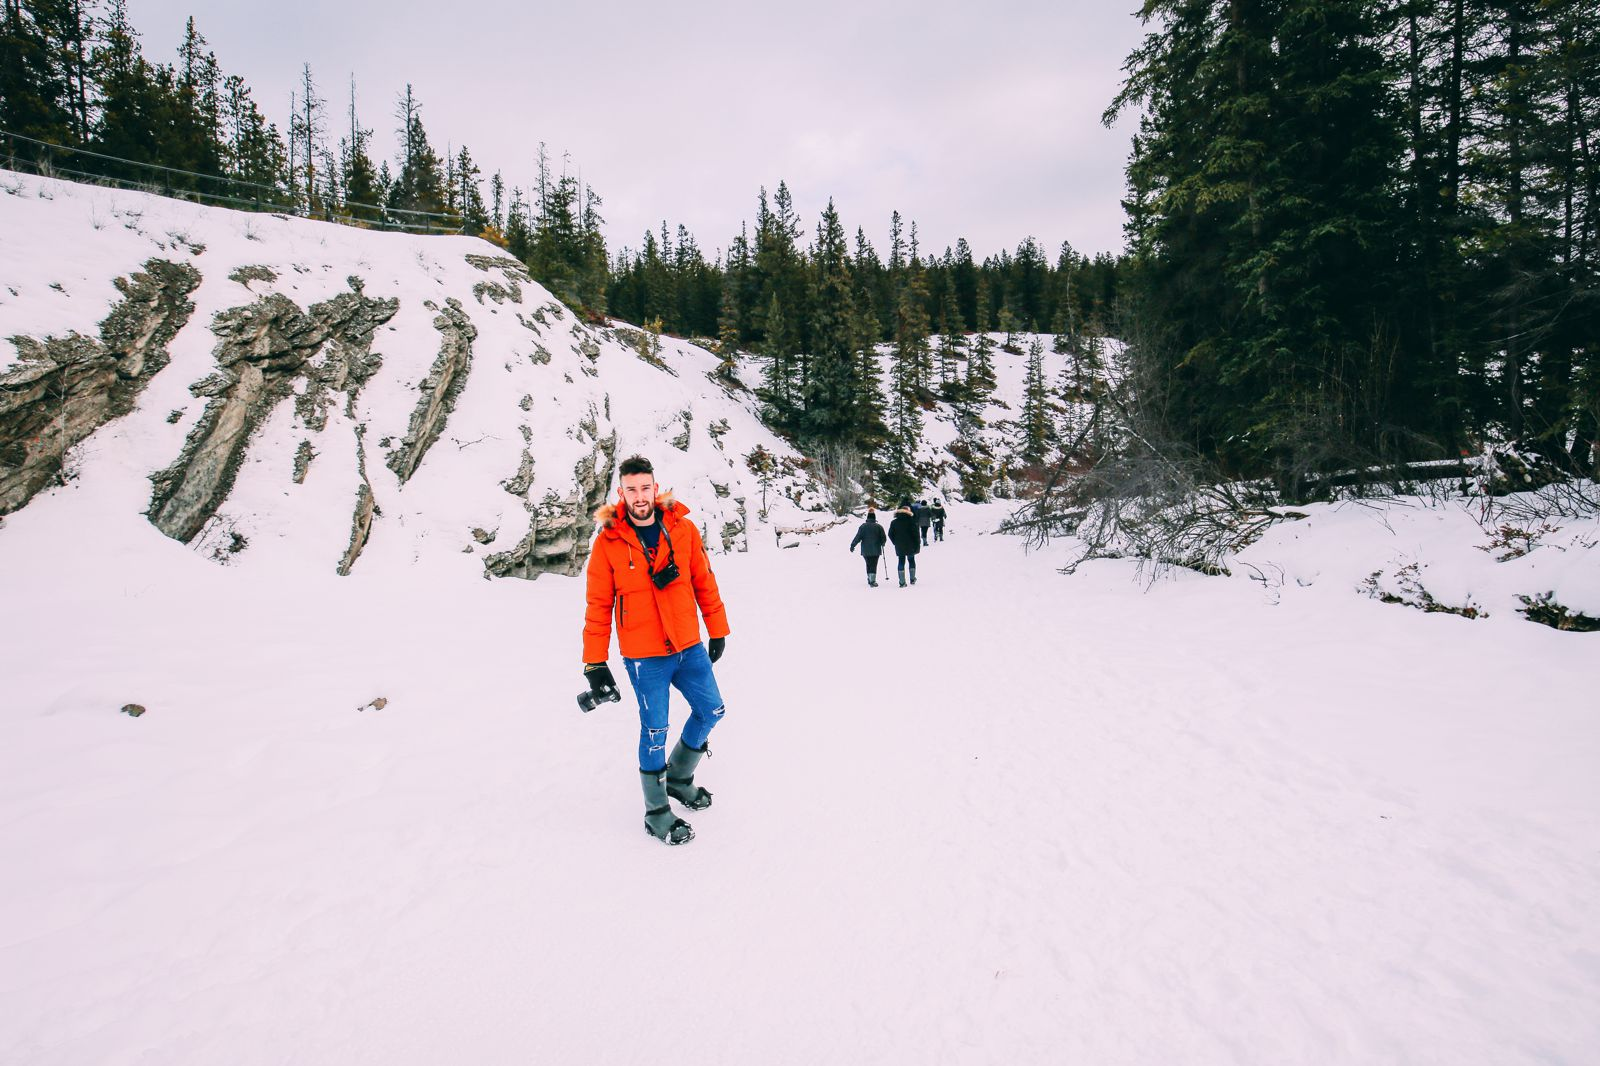 The Most Beautiful Place In Jasper (Canada) You've Never Heard Of! (2)